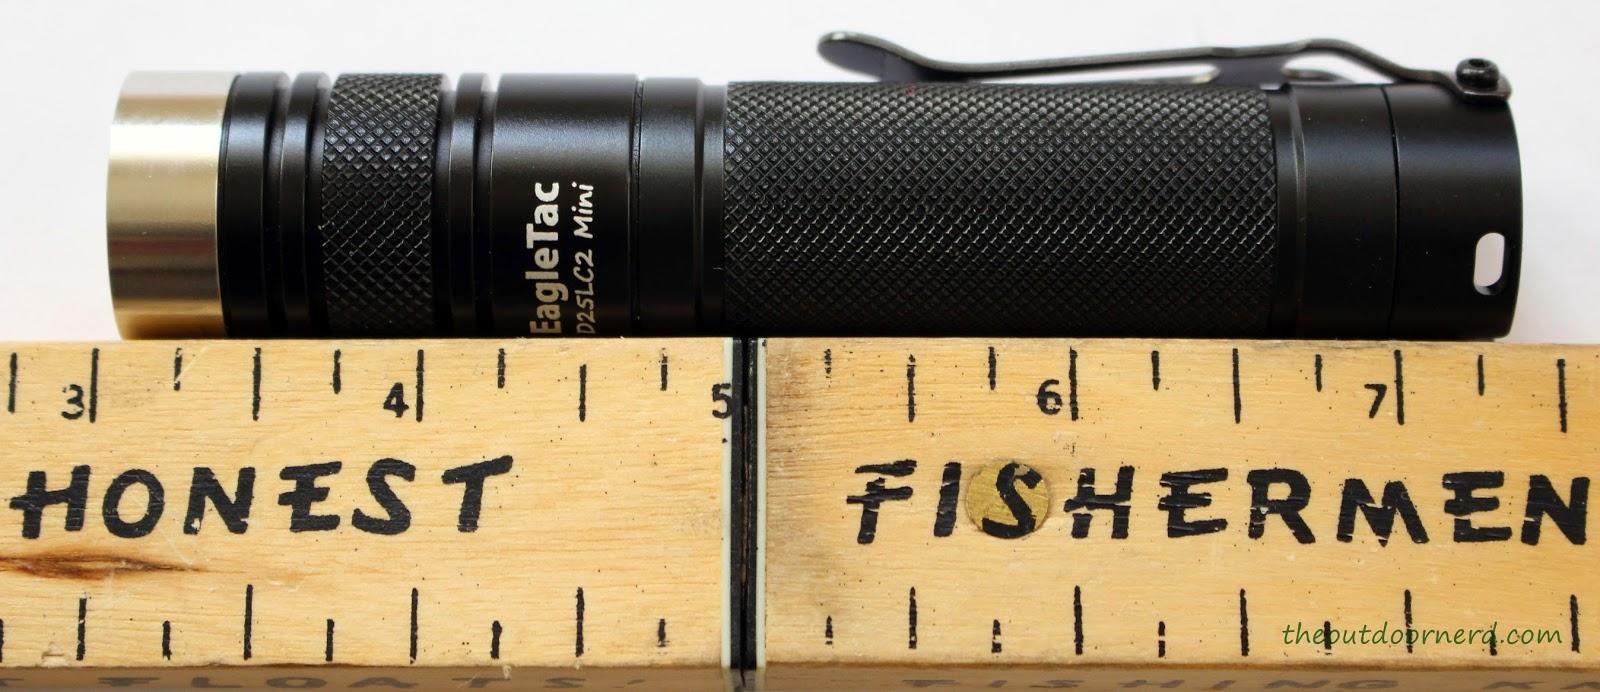 EagleTac D25LC2 Mini 18650 Flashlight Next To Ruler